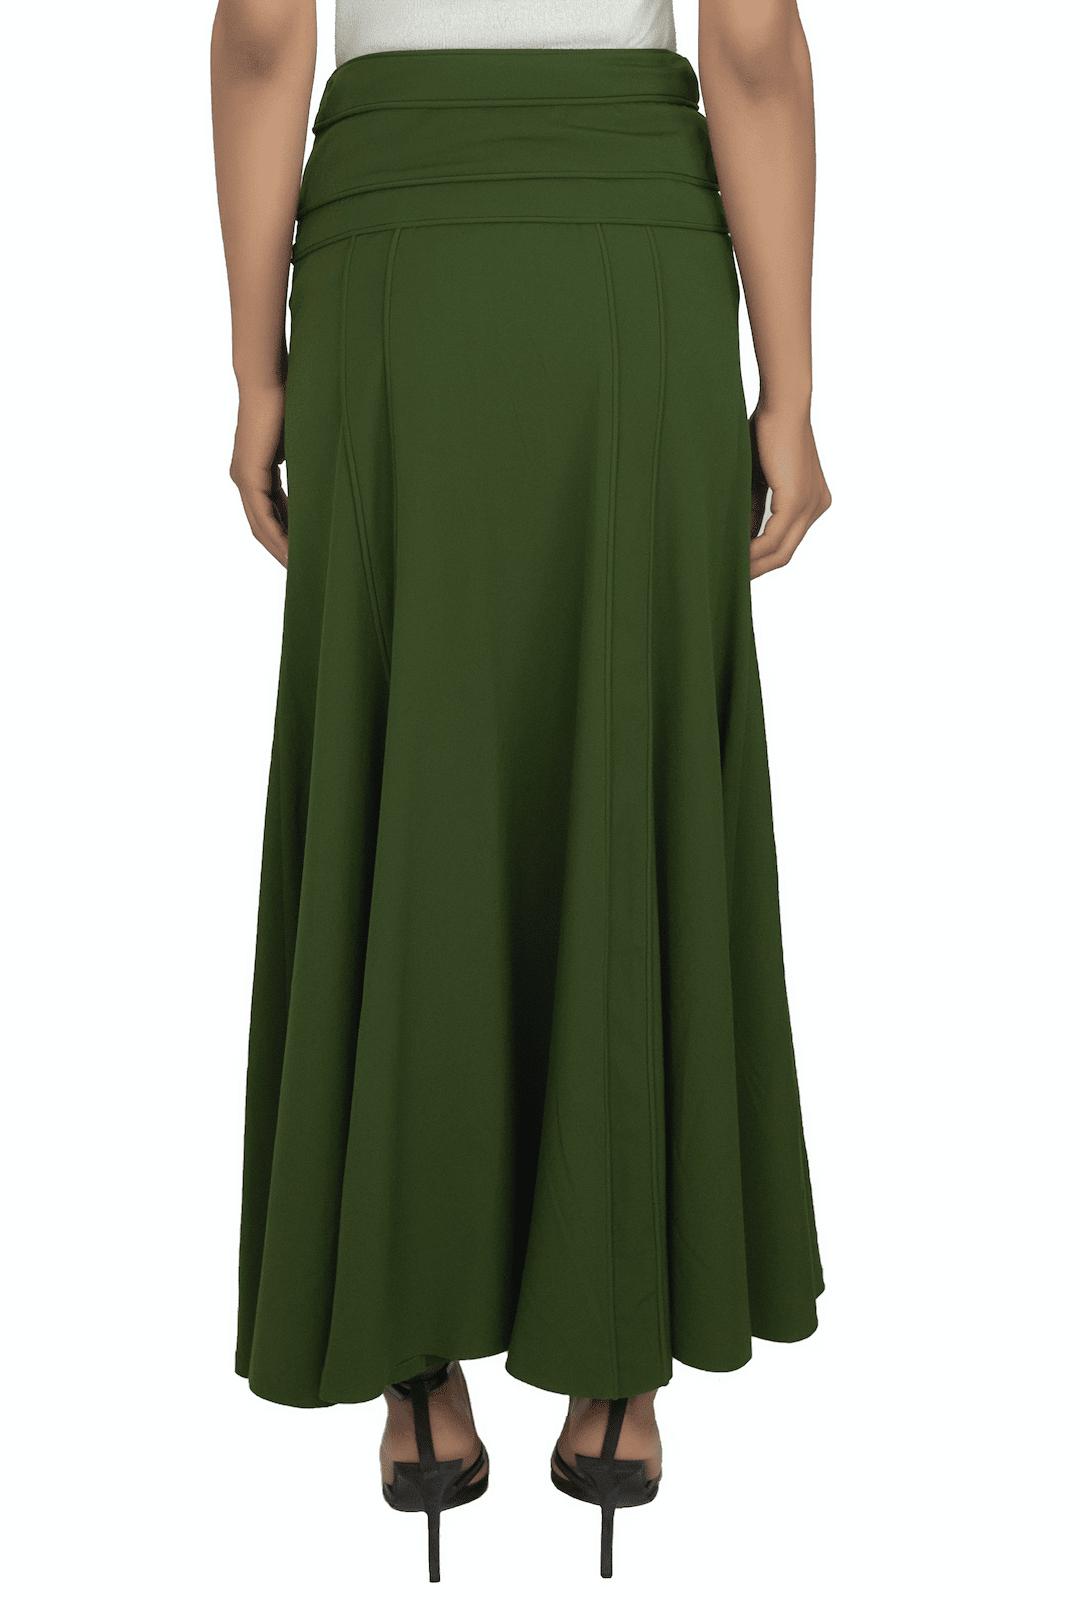 Skirt COLUMBA 3